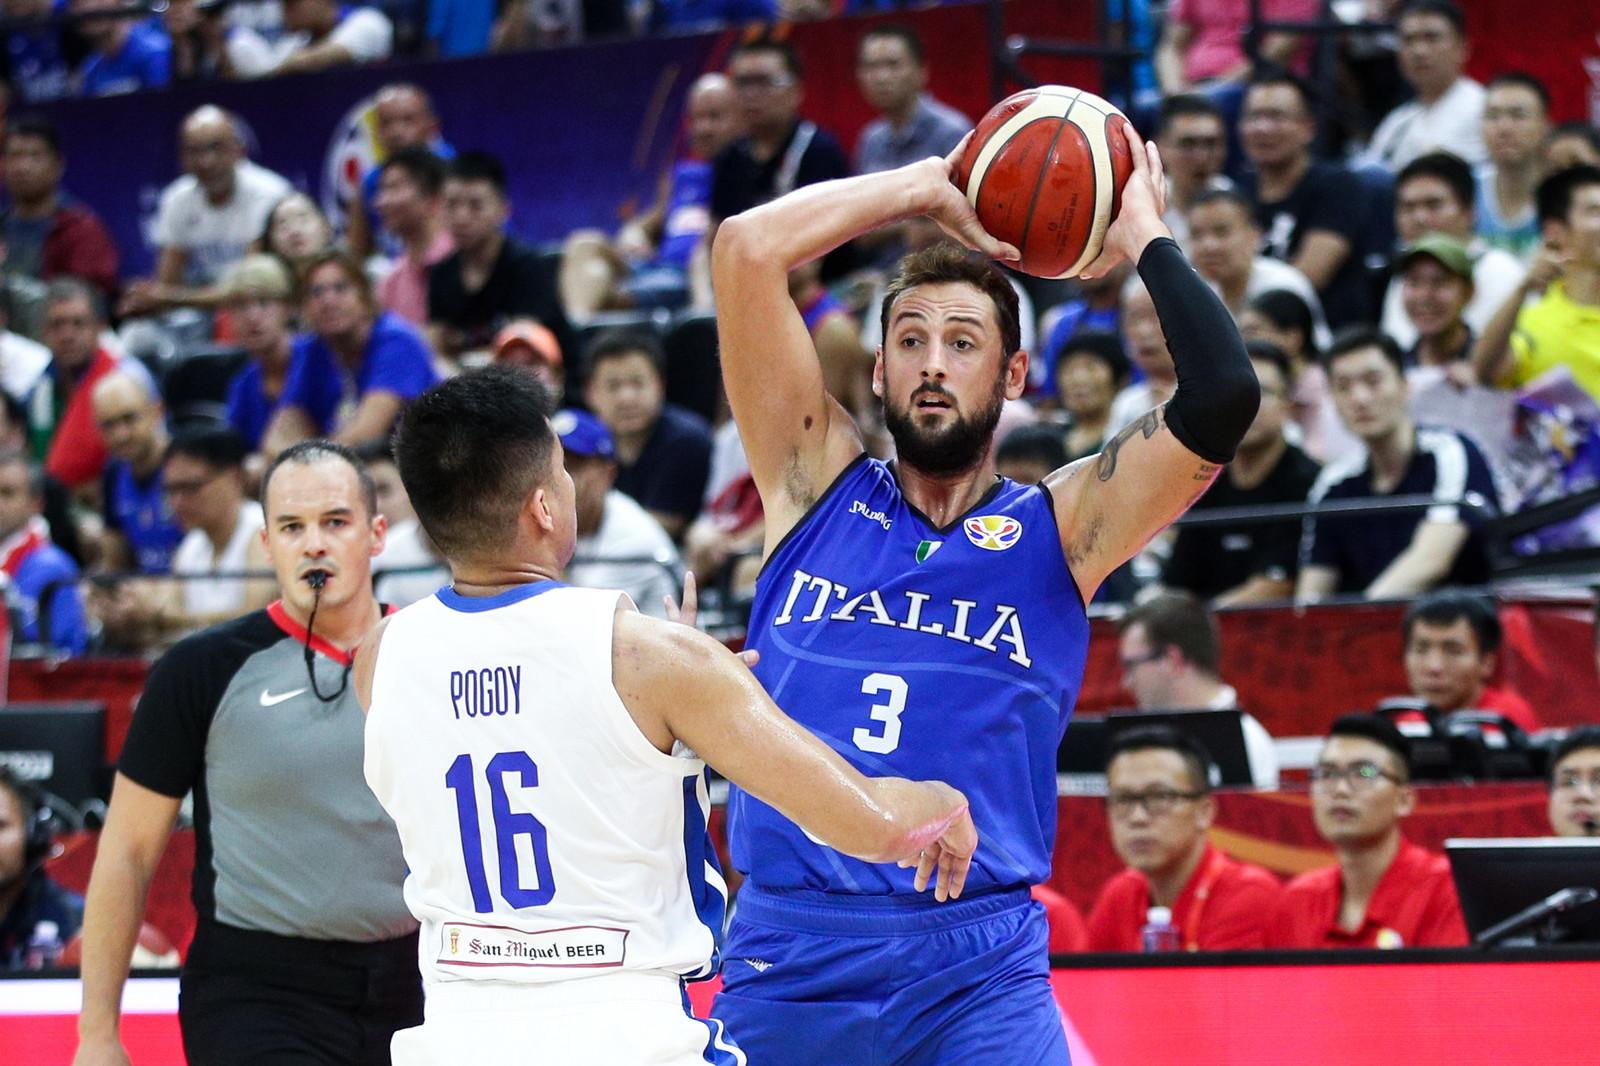 Ai Mondiali gli Azzurri travolgono le Filippine